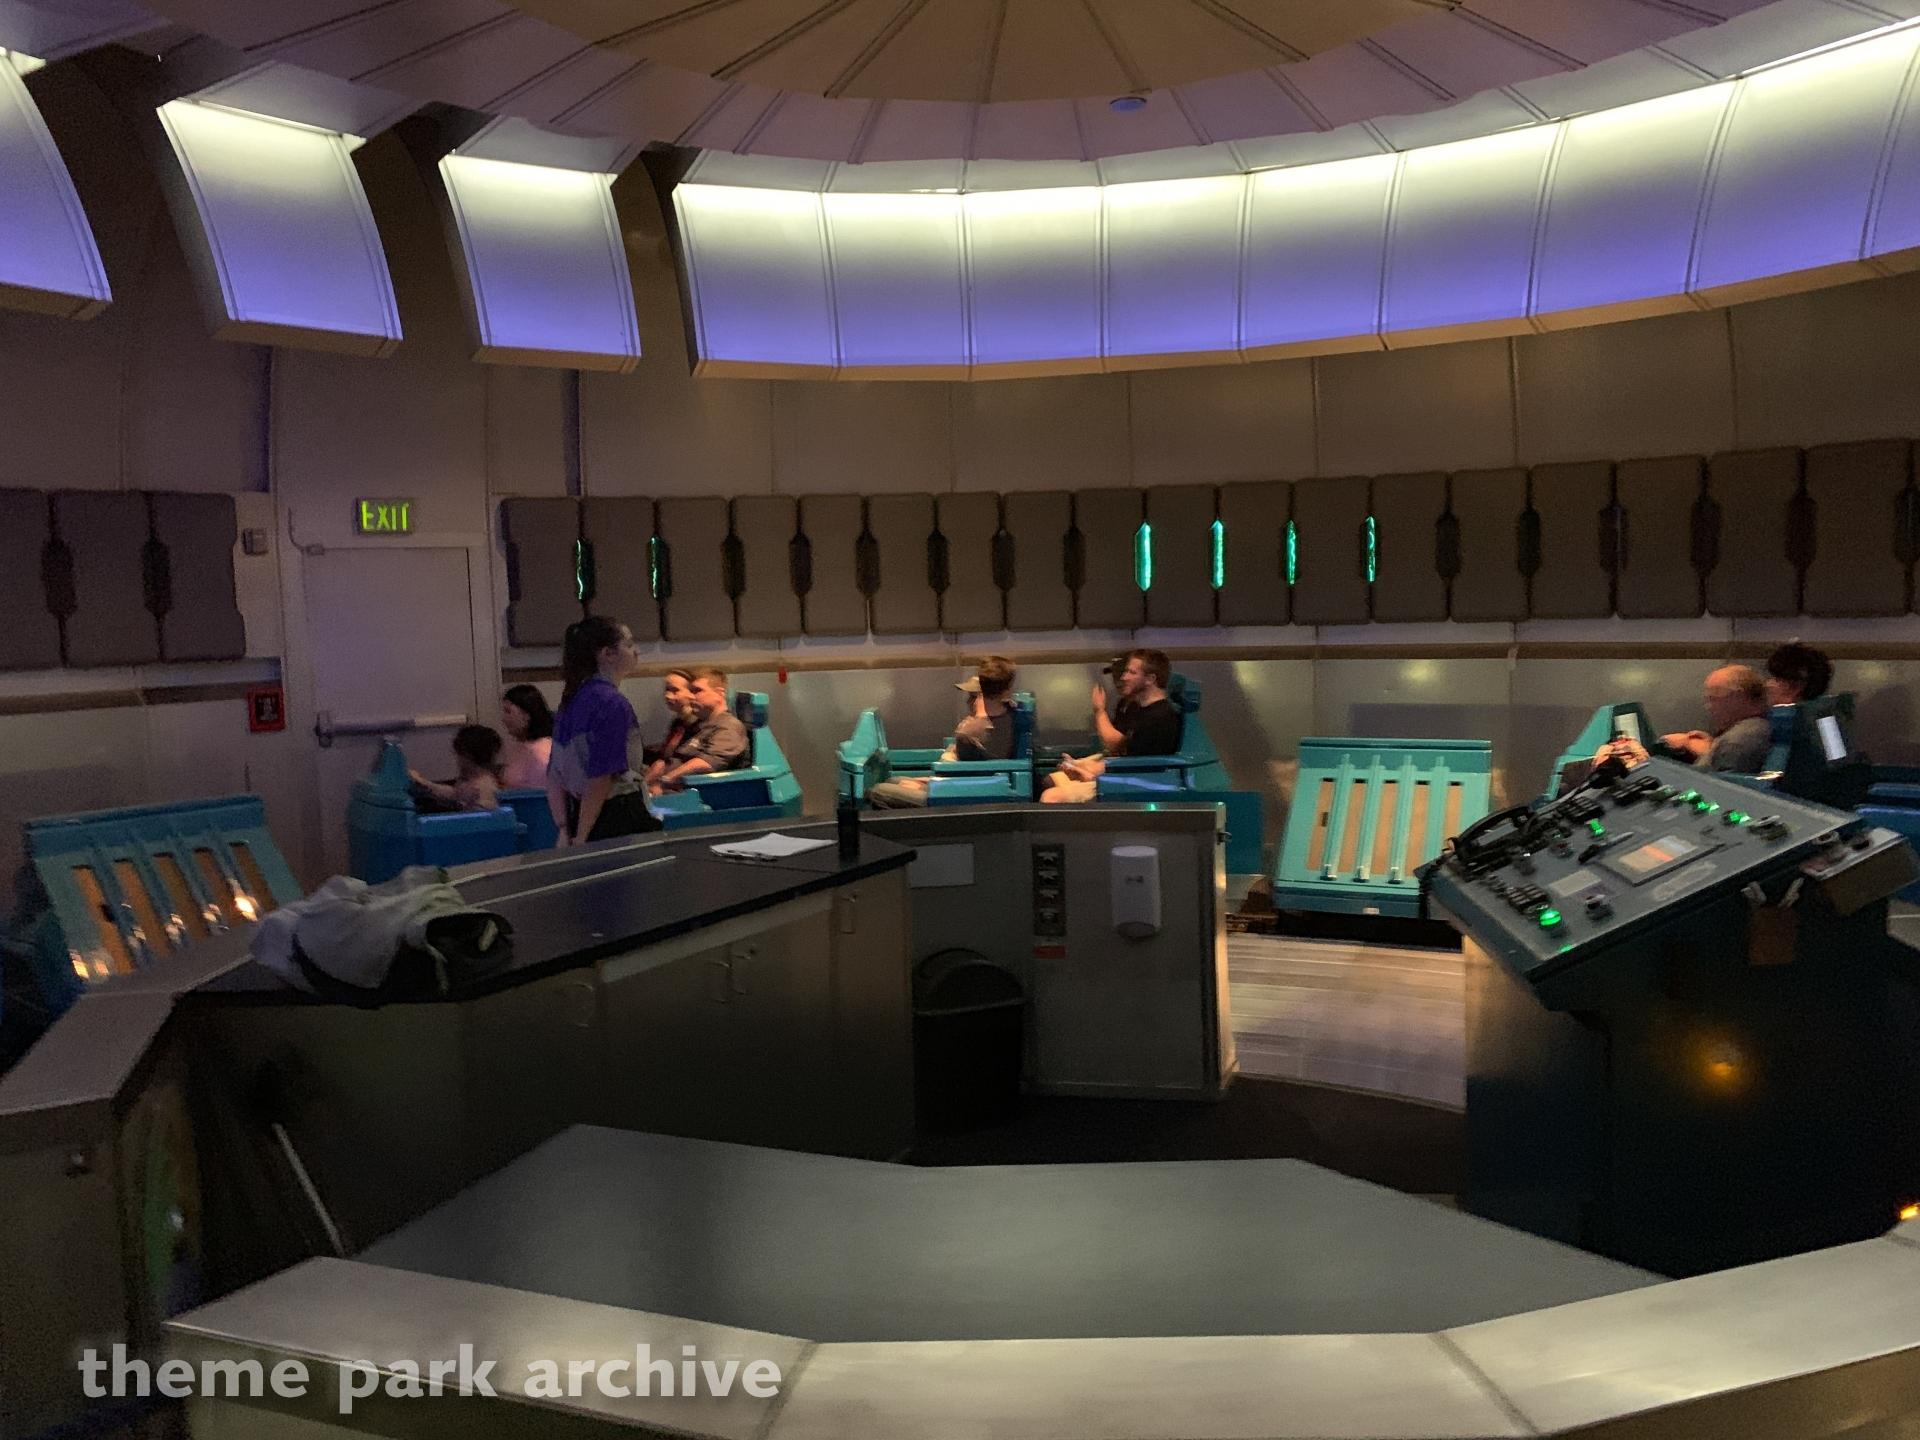 Spaceship Earth at EPCOT